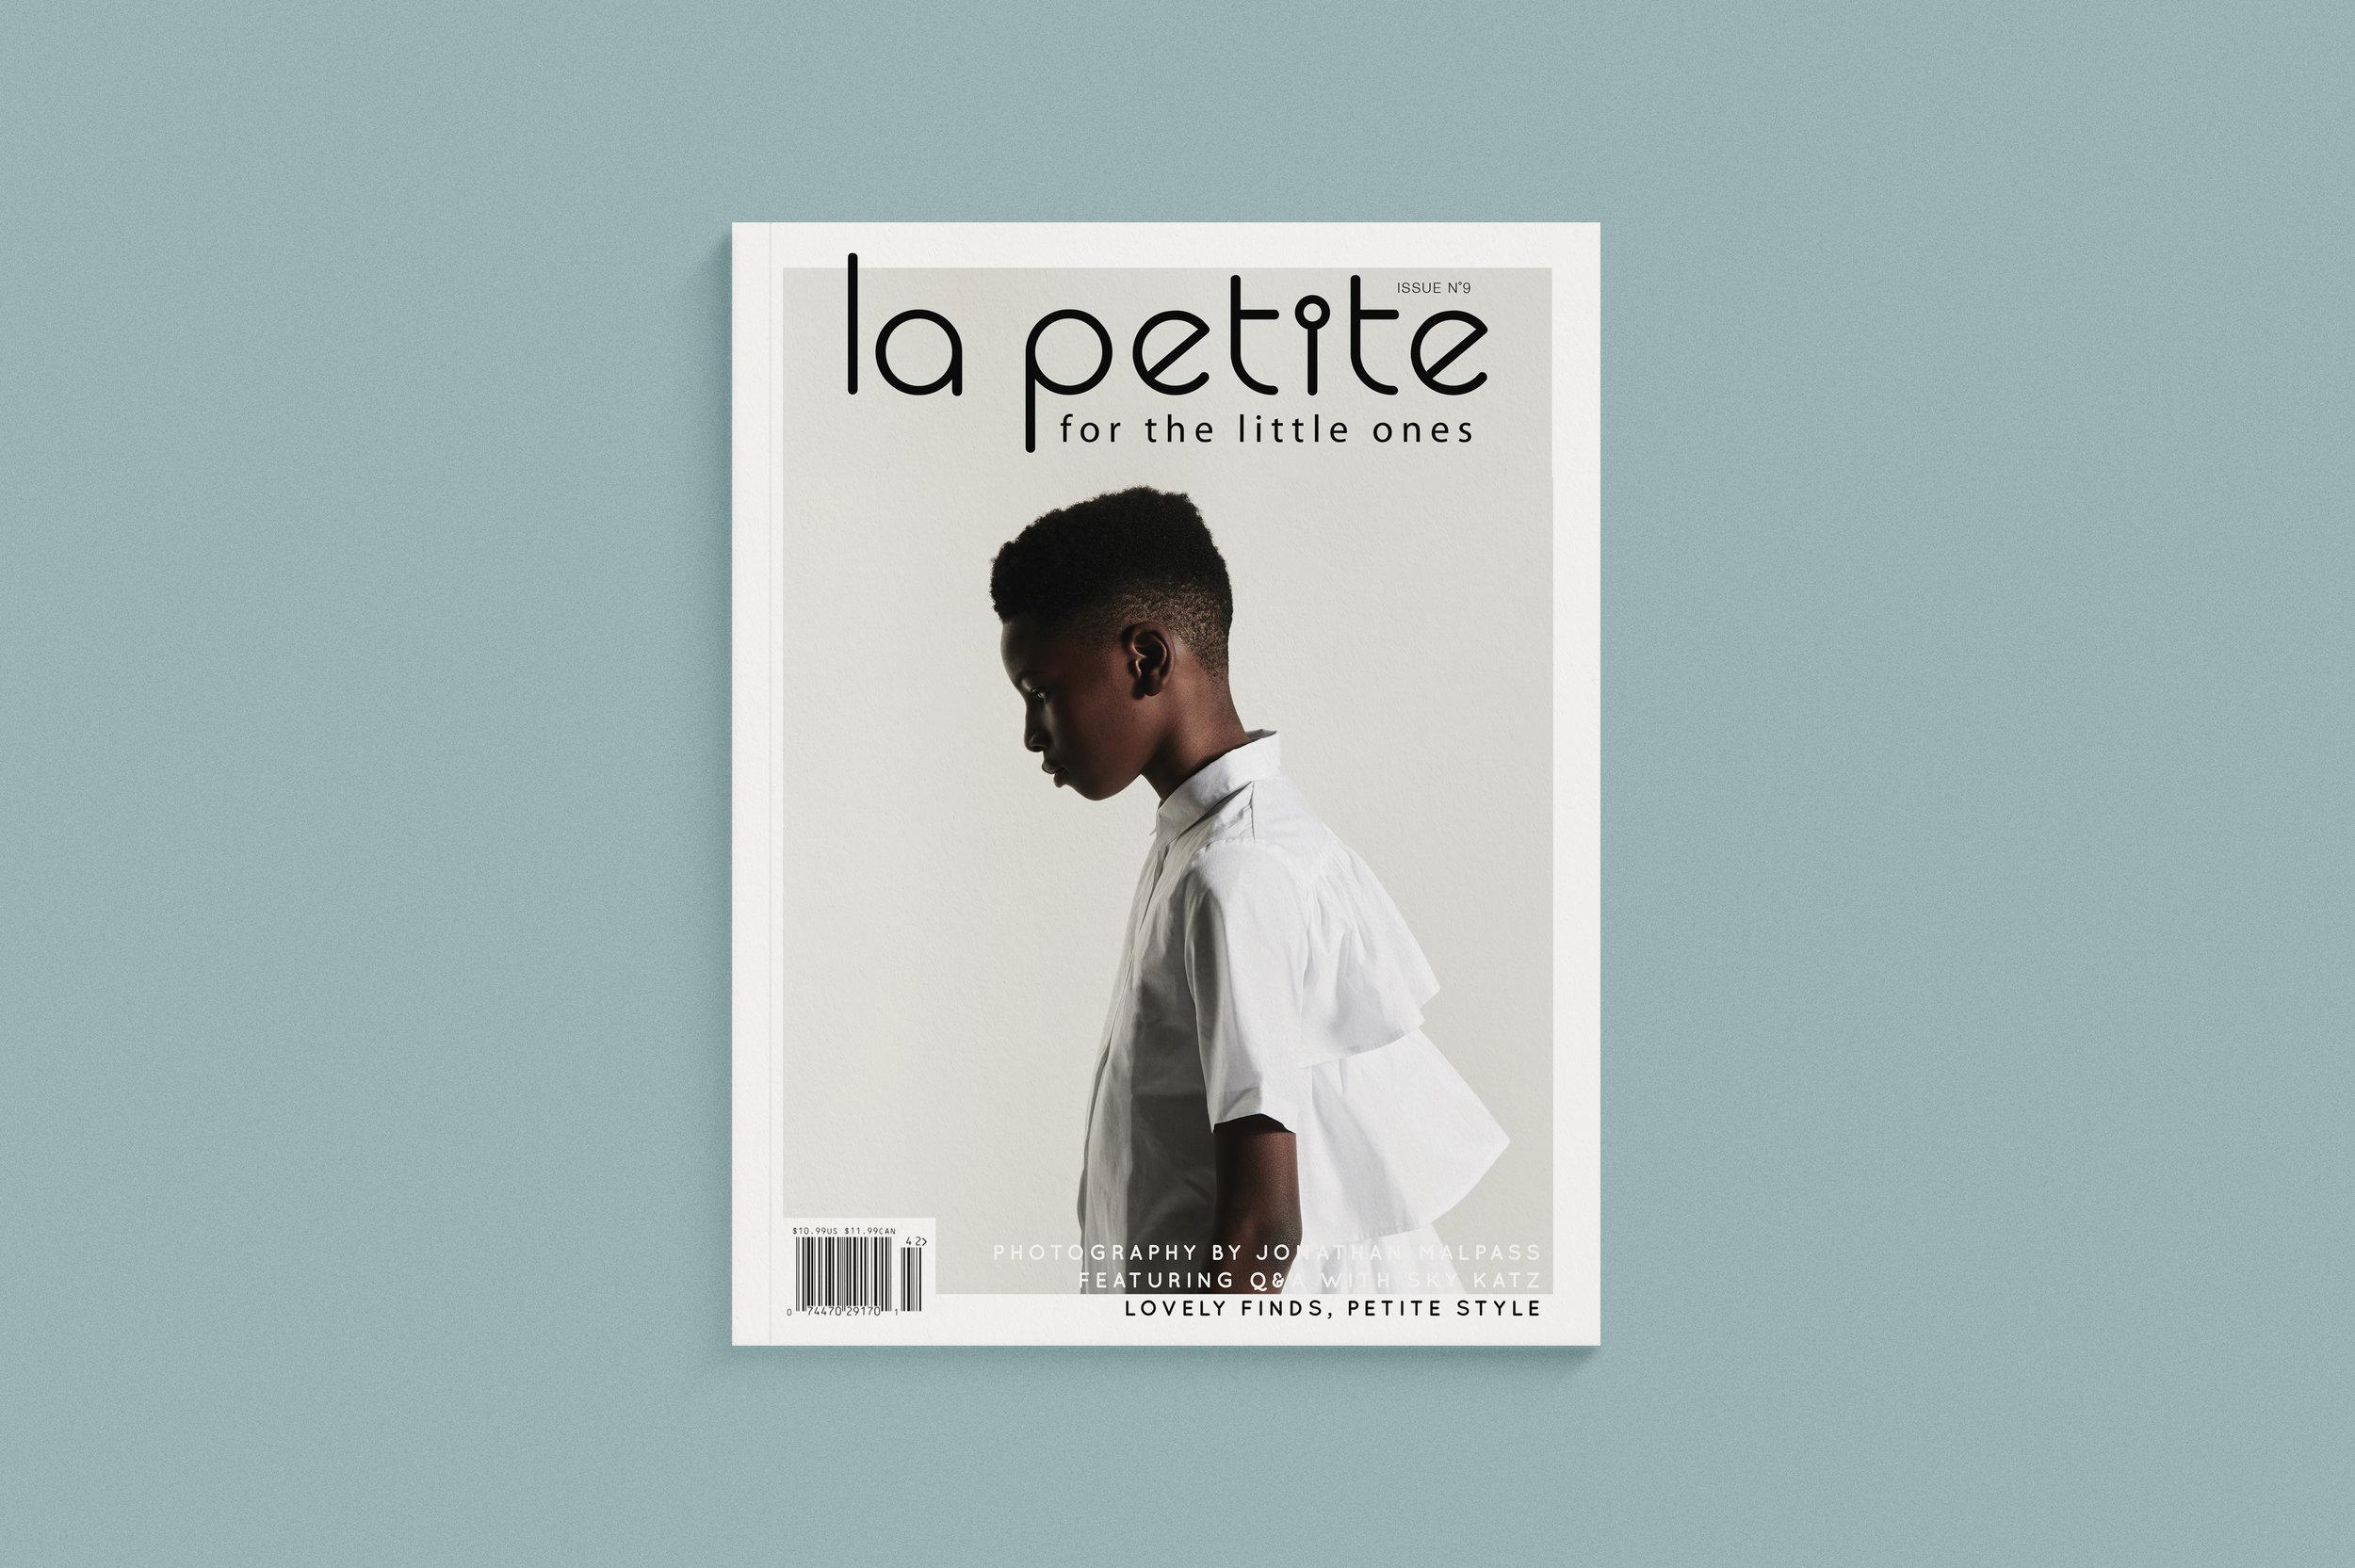 LaPetite-Spreads-Cover3.jpg